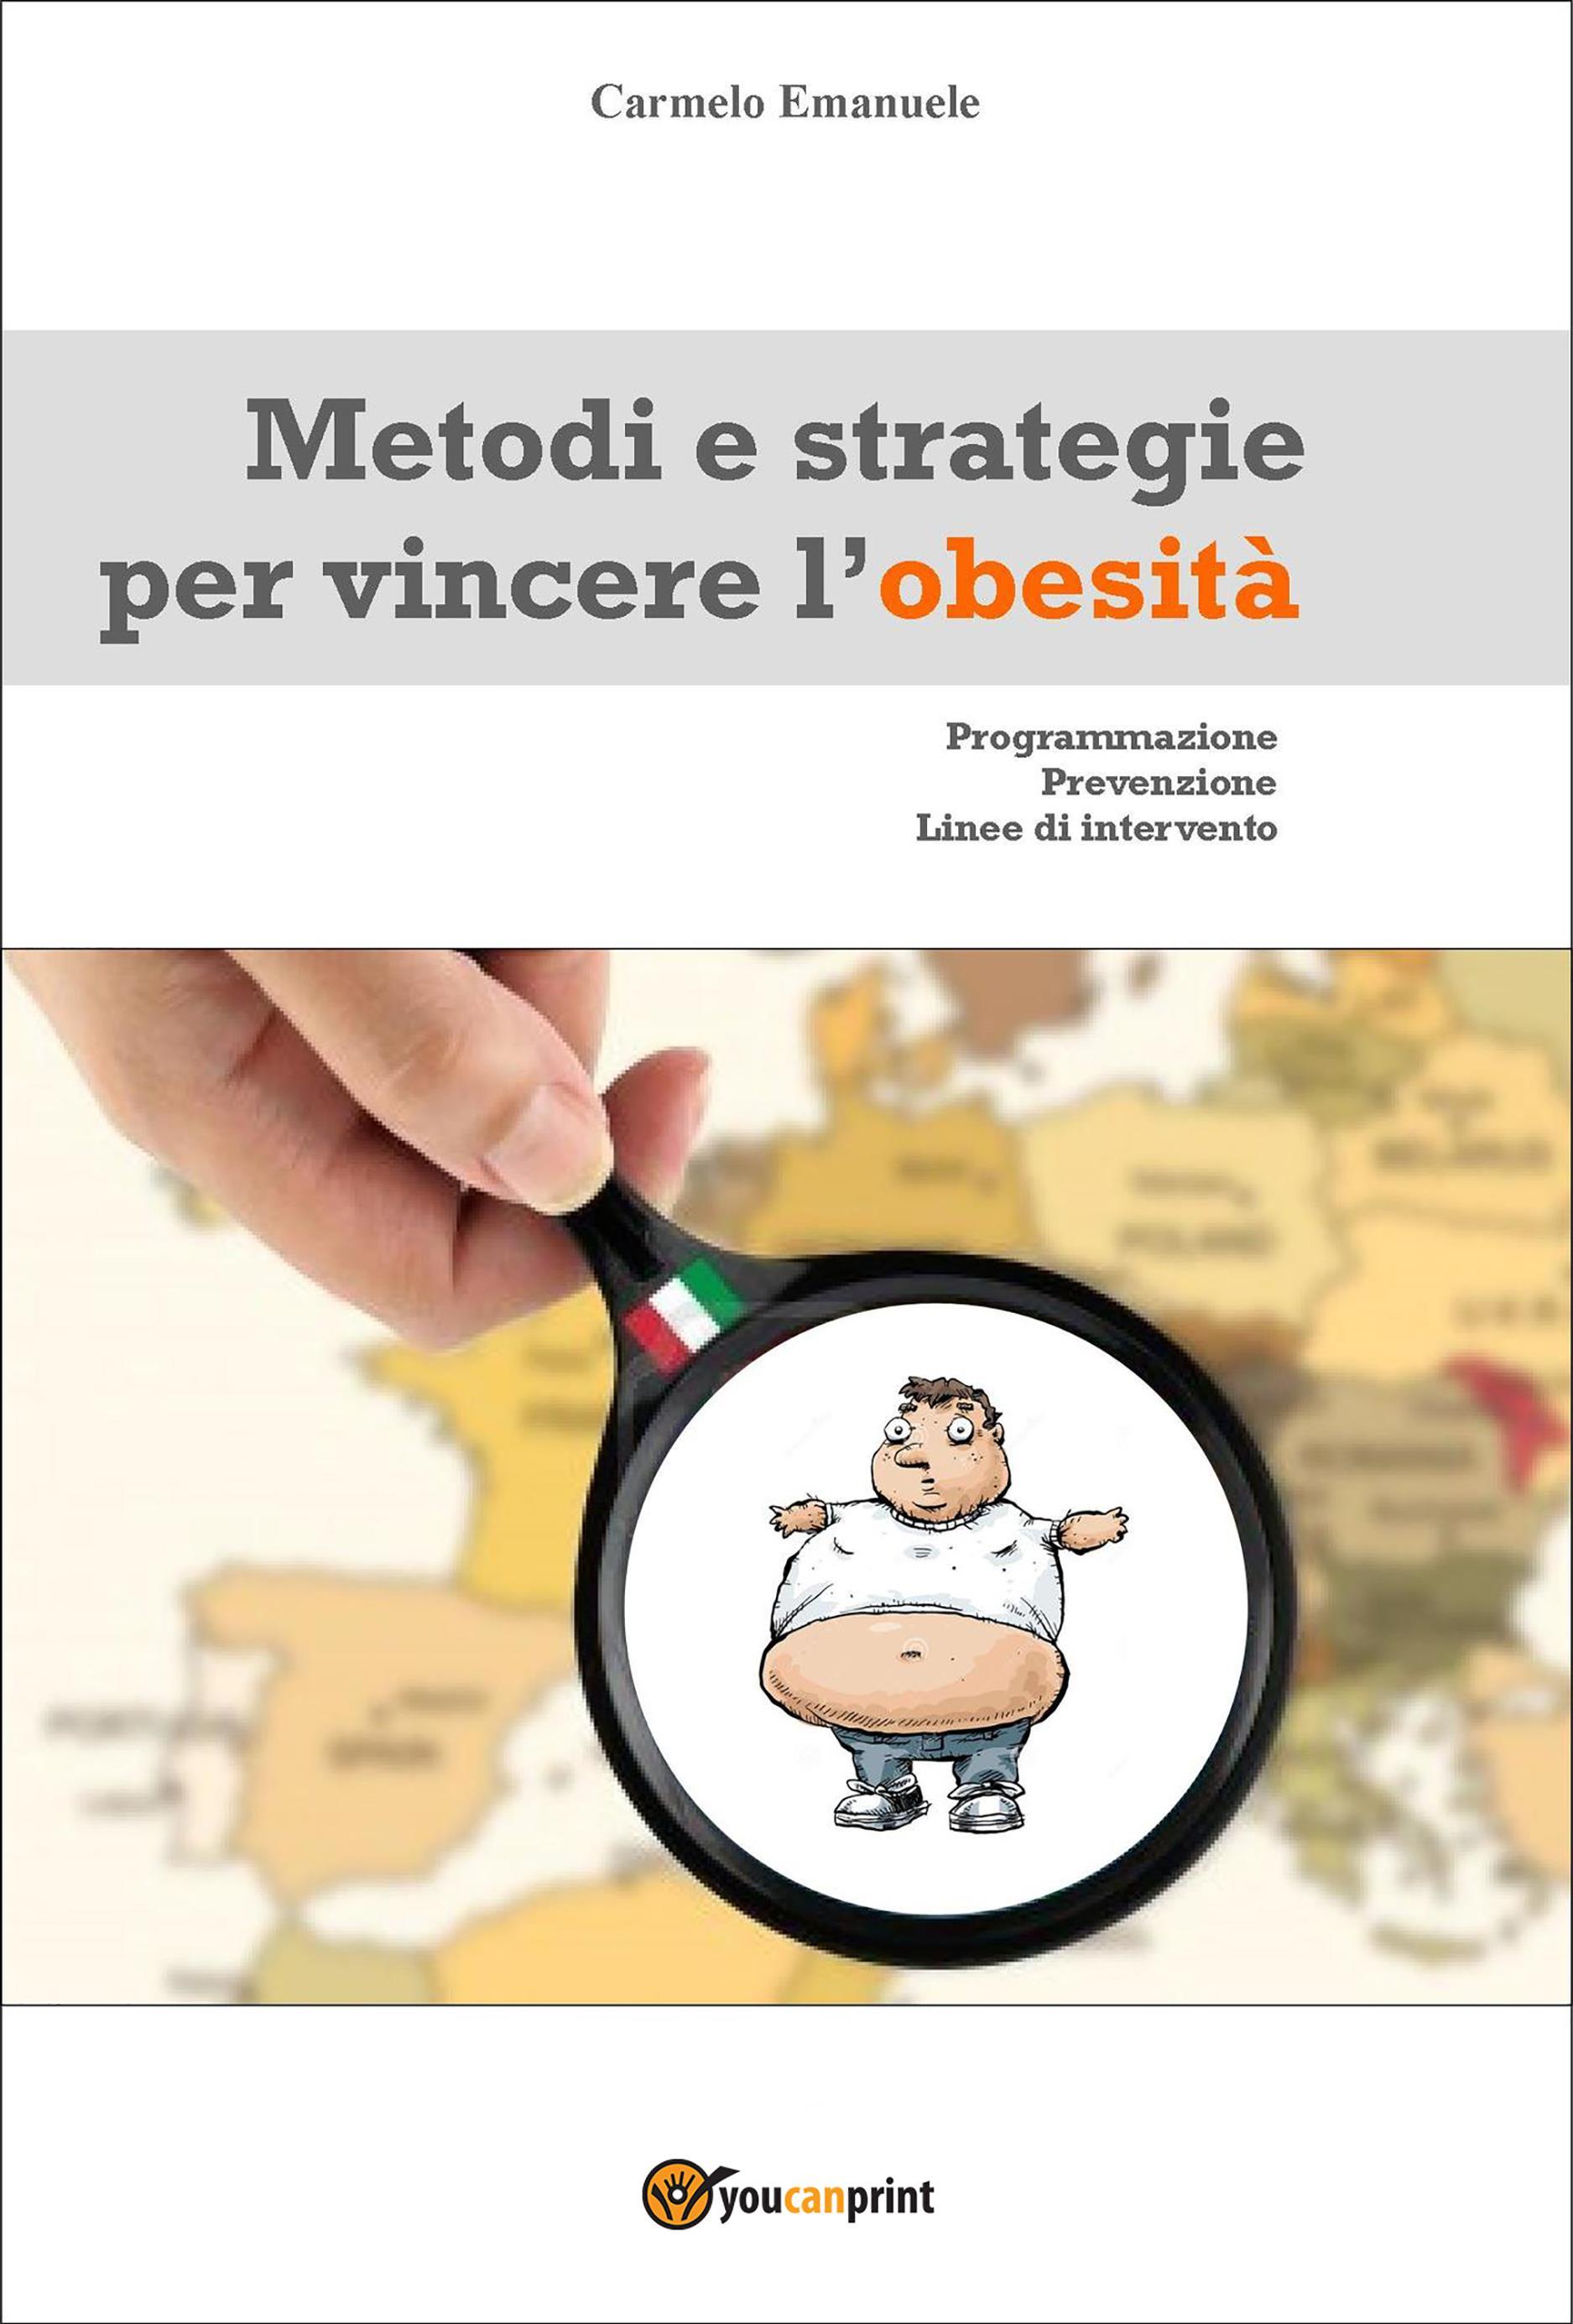 Metodi e strategie per vincere l'obesità